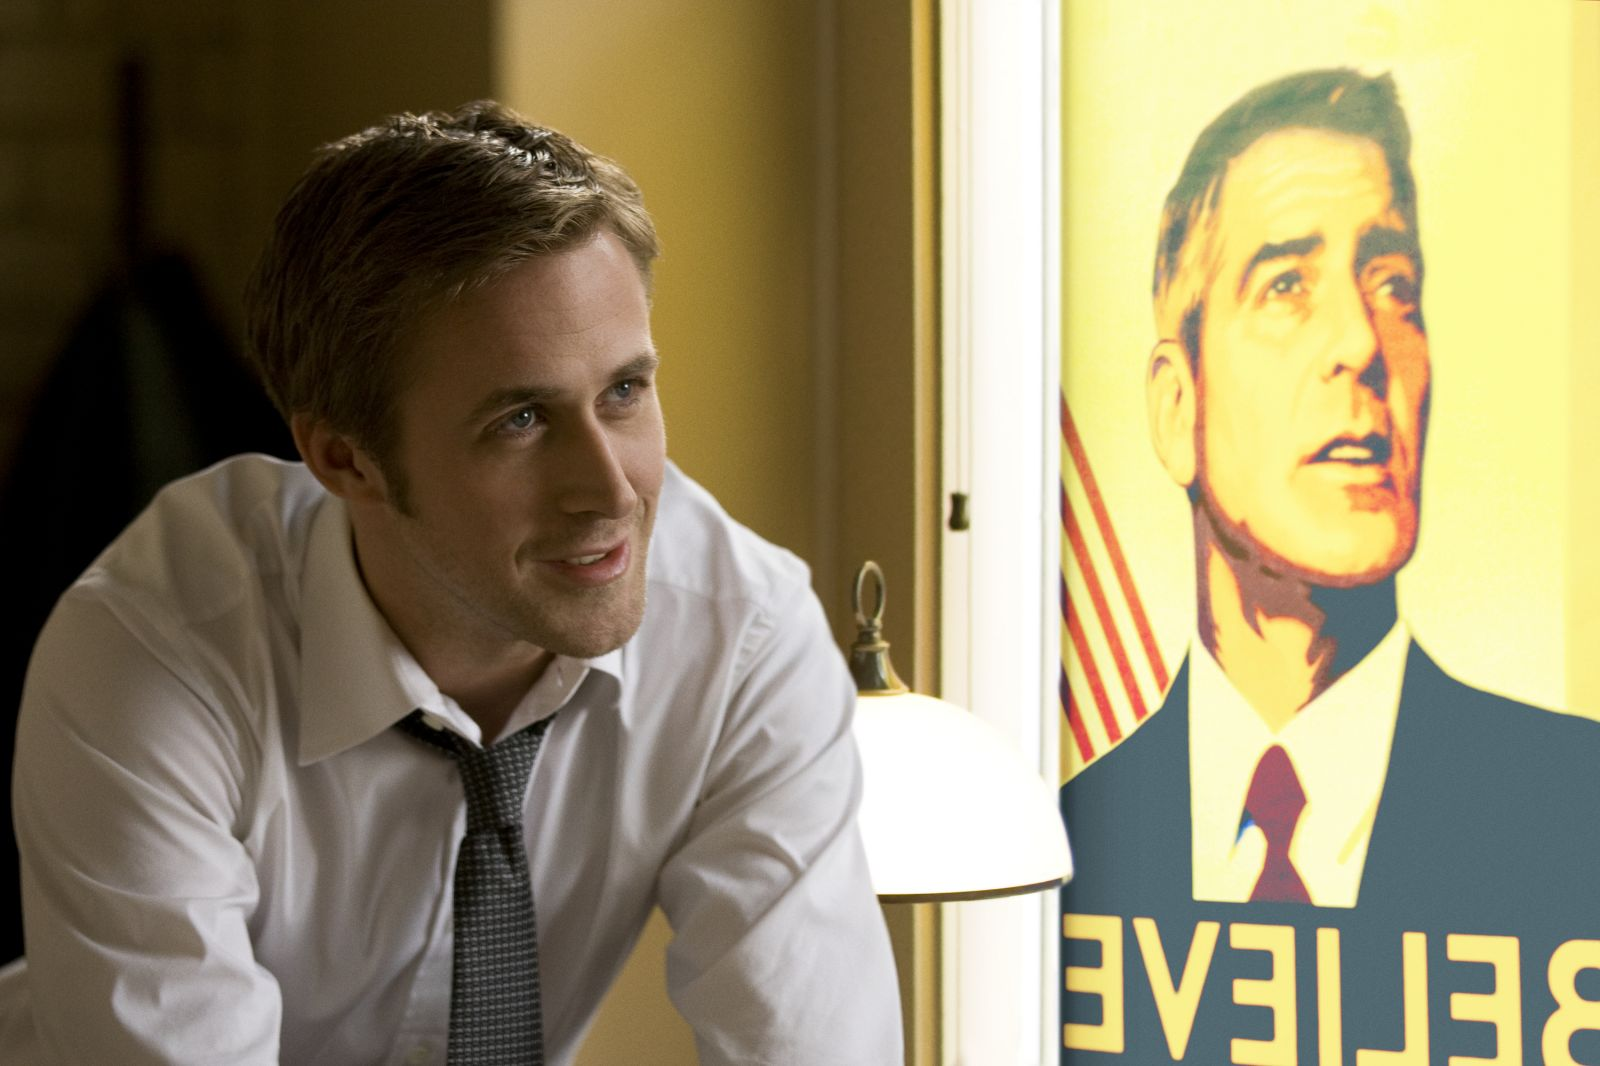 http://1.bp.blogspot.com/-nmv0TKNjOgQ/TvkquQa6MLI/AAAAAAAAFm0/UGIynyejbAE/s1600/ides-of-march-movie-image-ryan-gosling-1.jpg